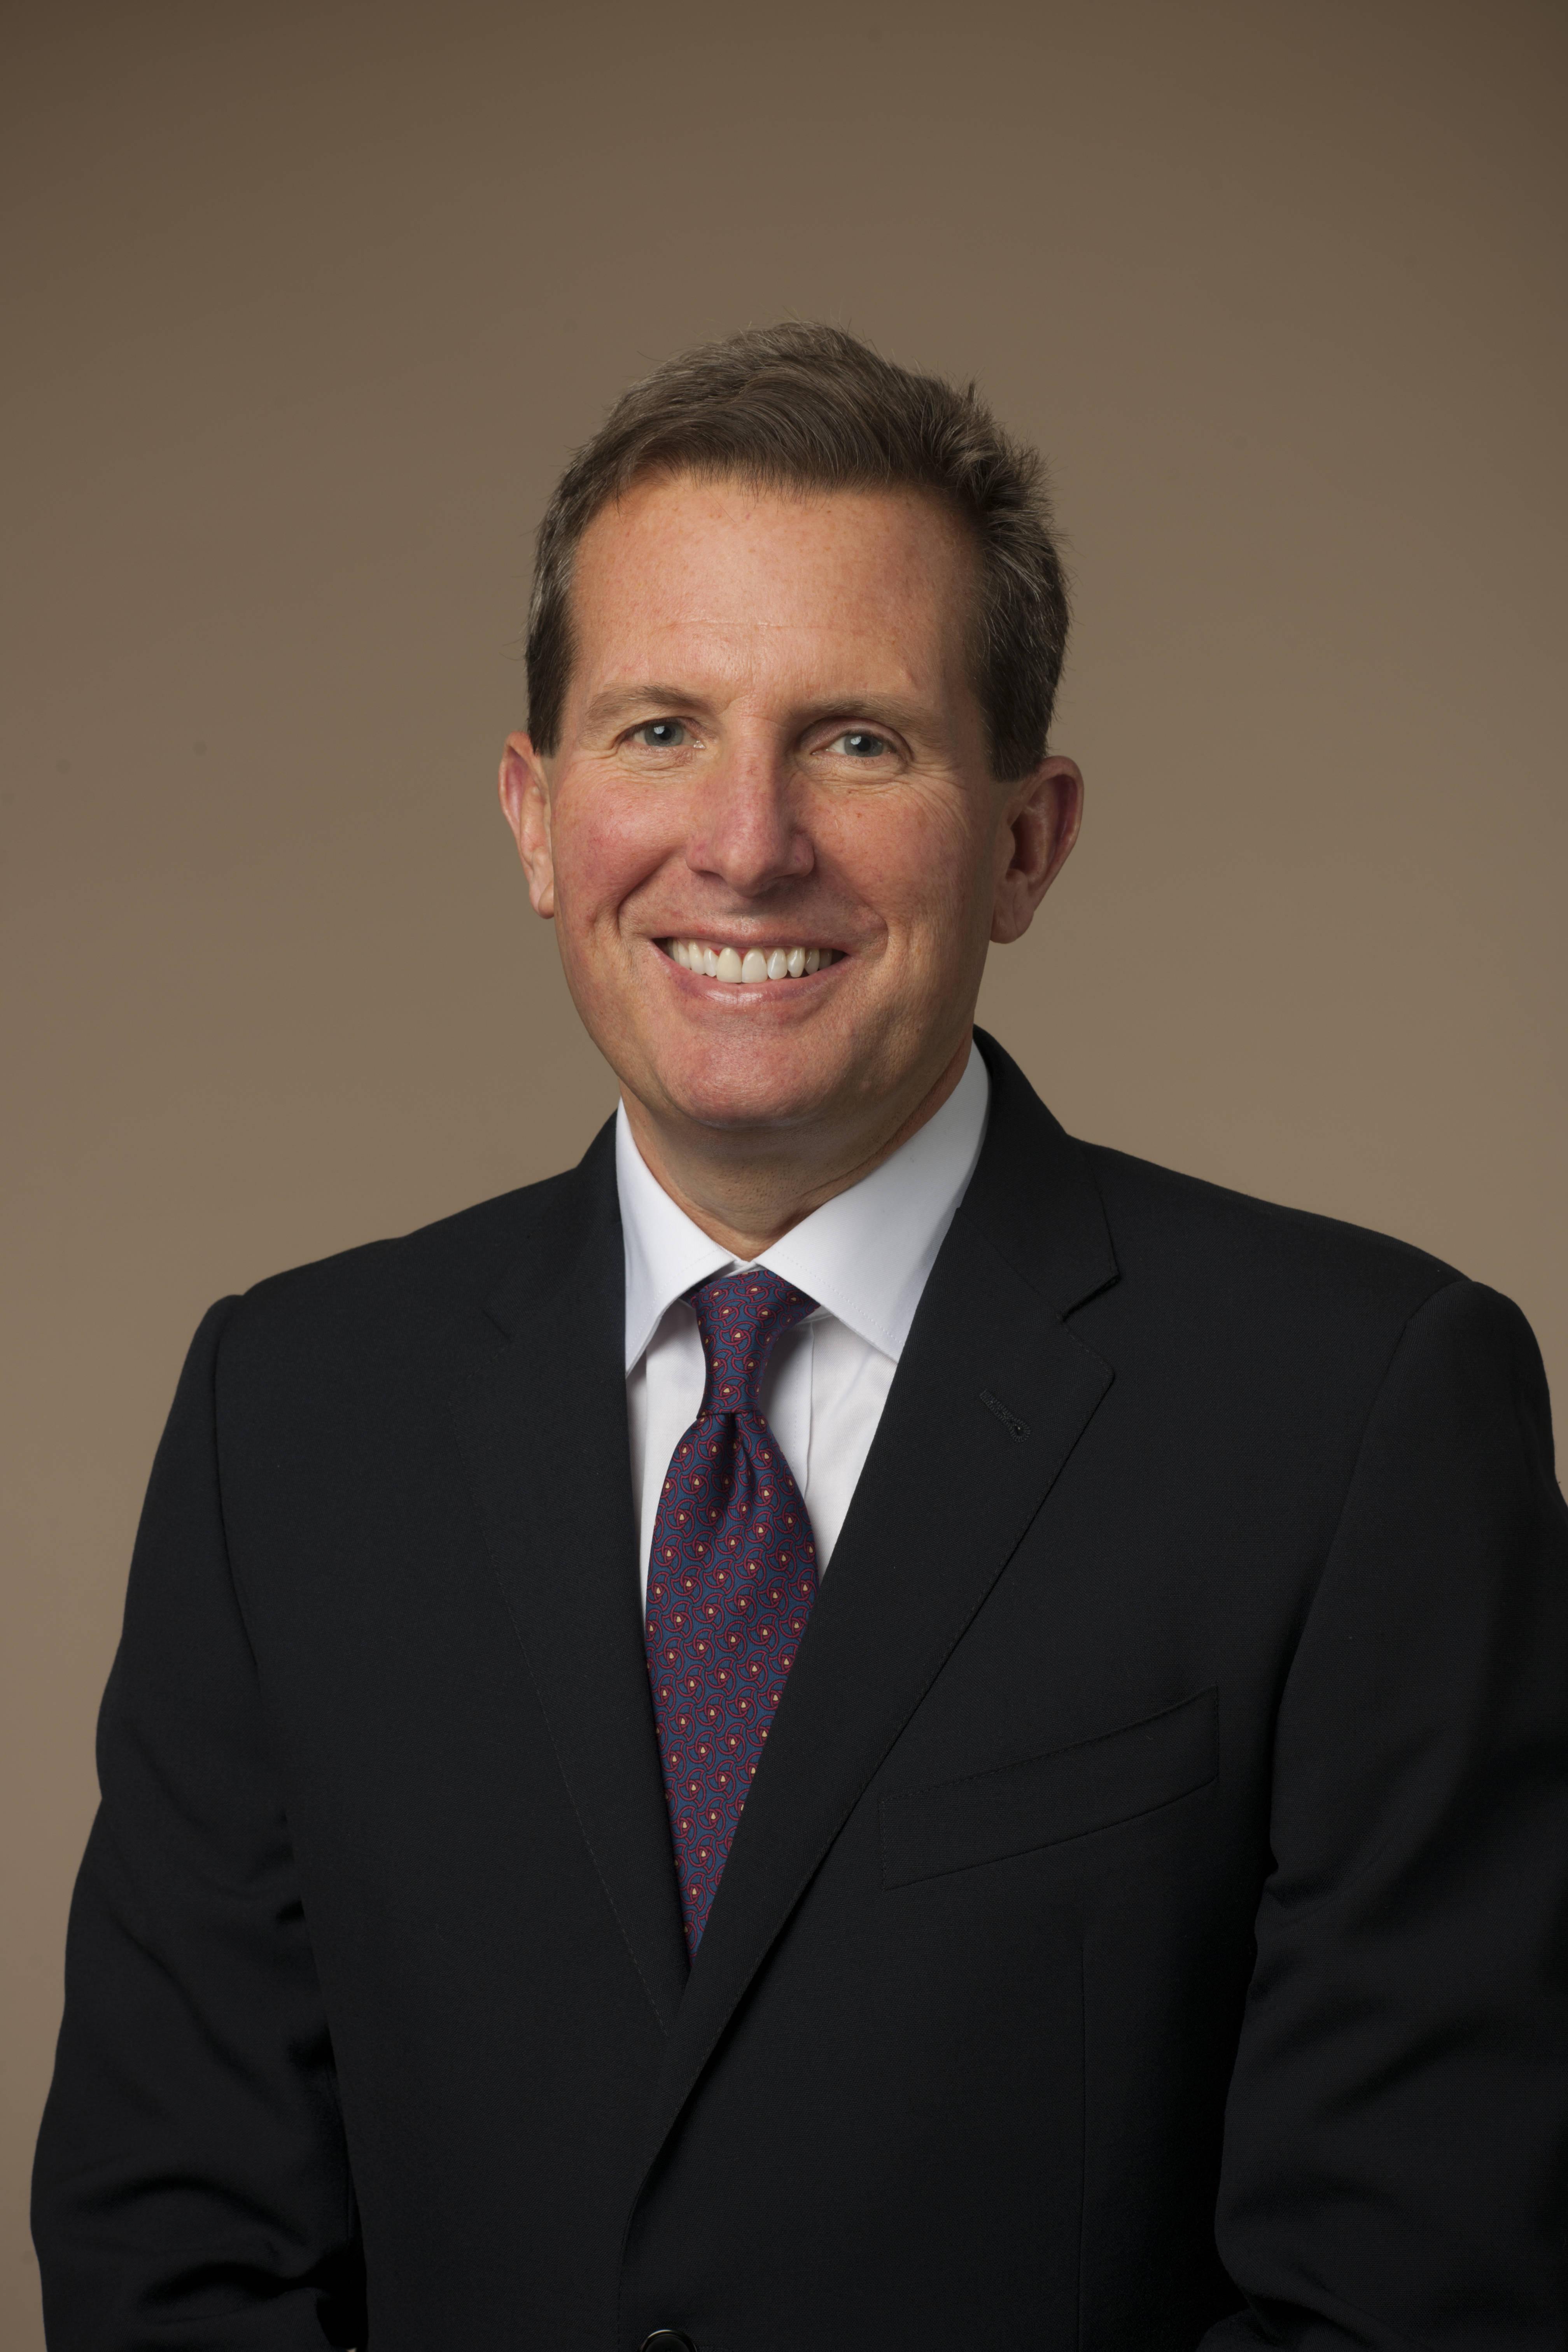 Geoff Ballotti